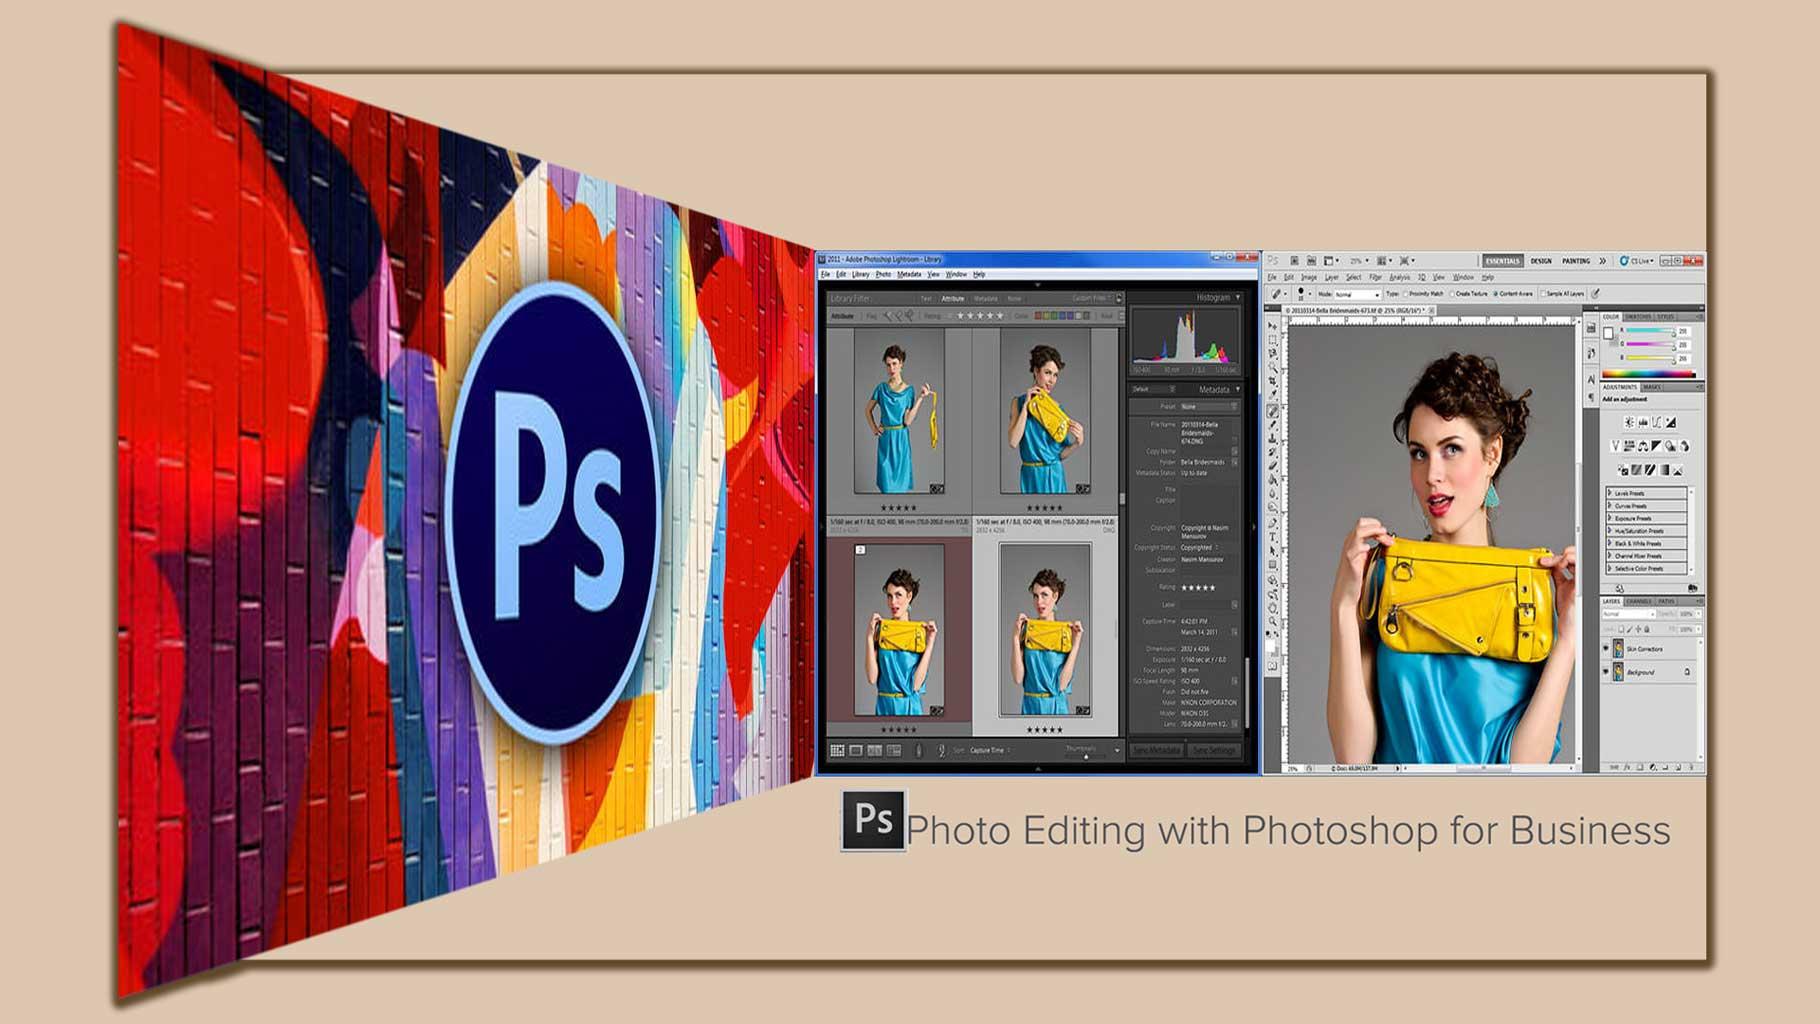 Photo editing  Photoshop 10 - 8 تا از مزایای اصلی ویرایش عکس با فتوشاپ برای کسب و کارتان